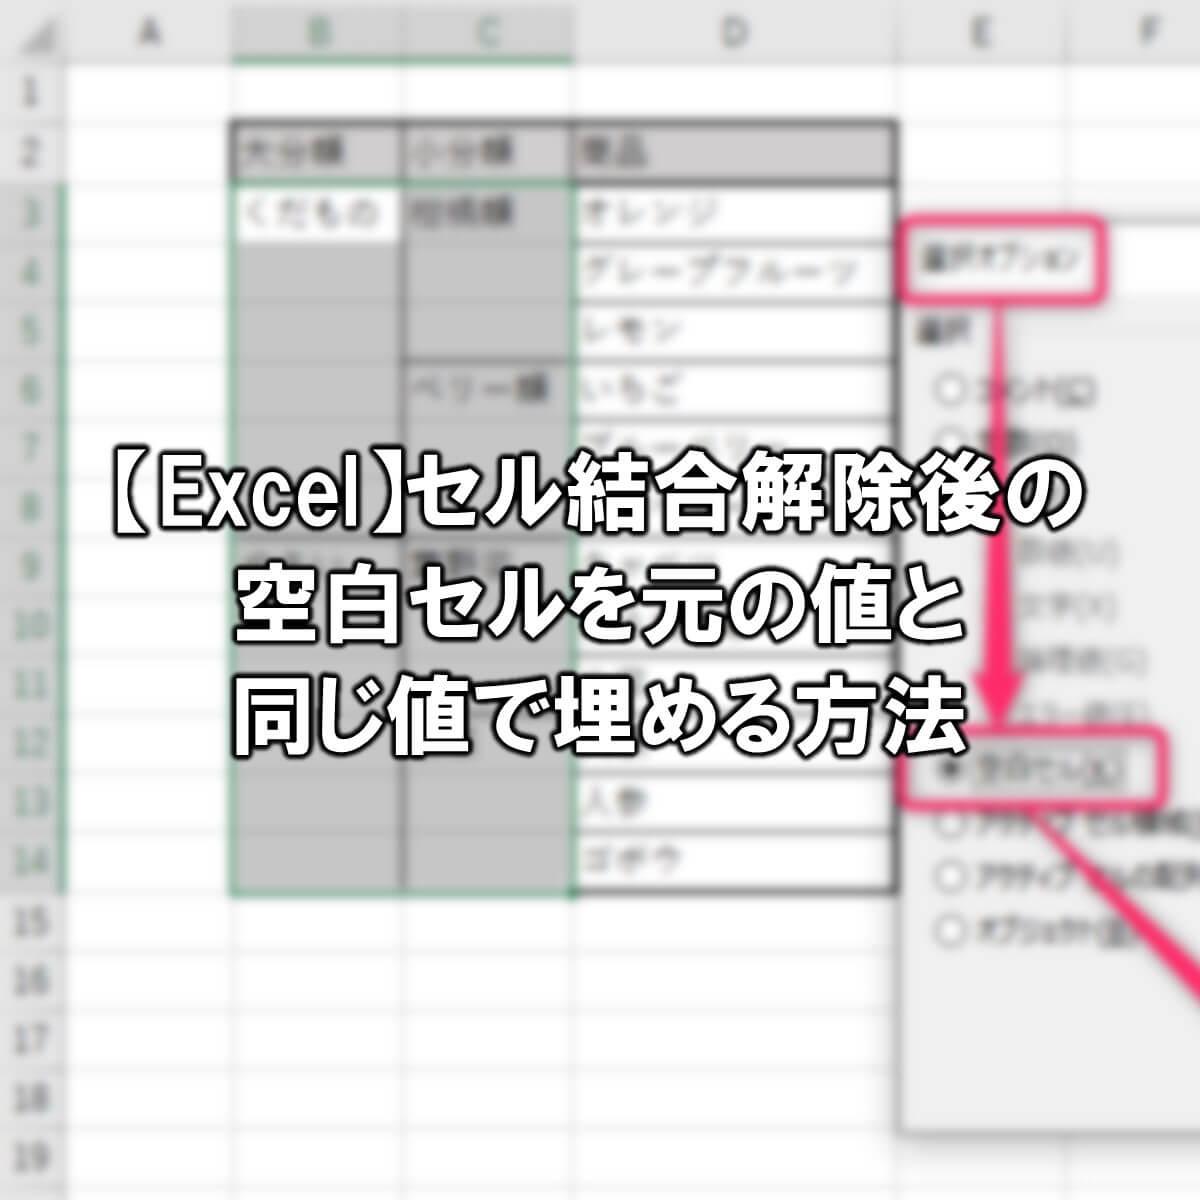 【Excel】セル結合解除後の空白セルを元の値と同じ値で埋める方法